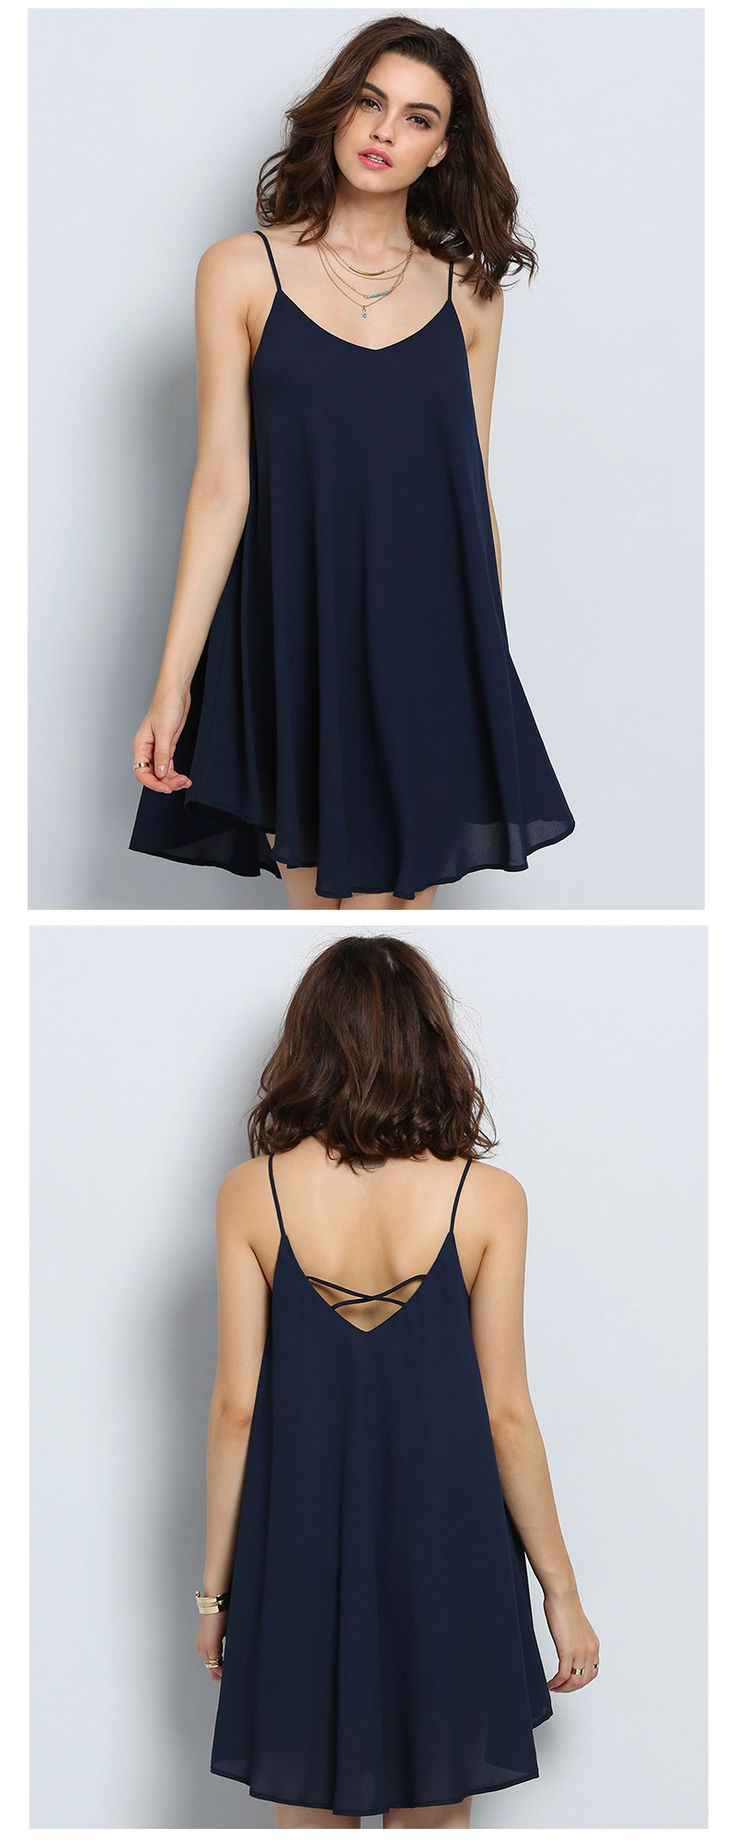 Best 25+ Cute dresses ideas on Pinterest   Pretty dresses ...